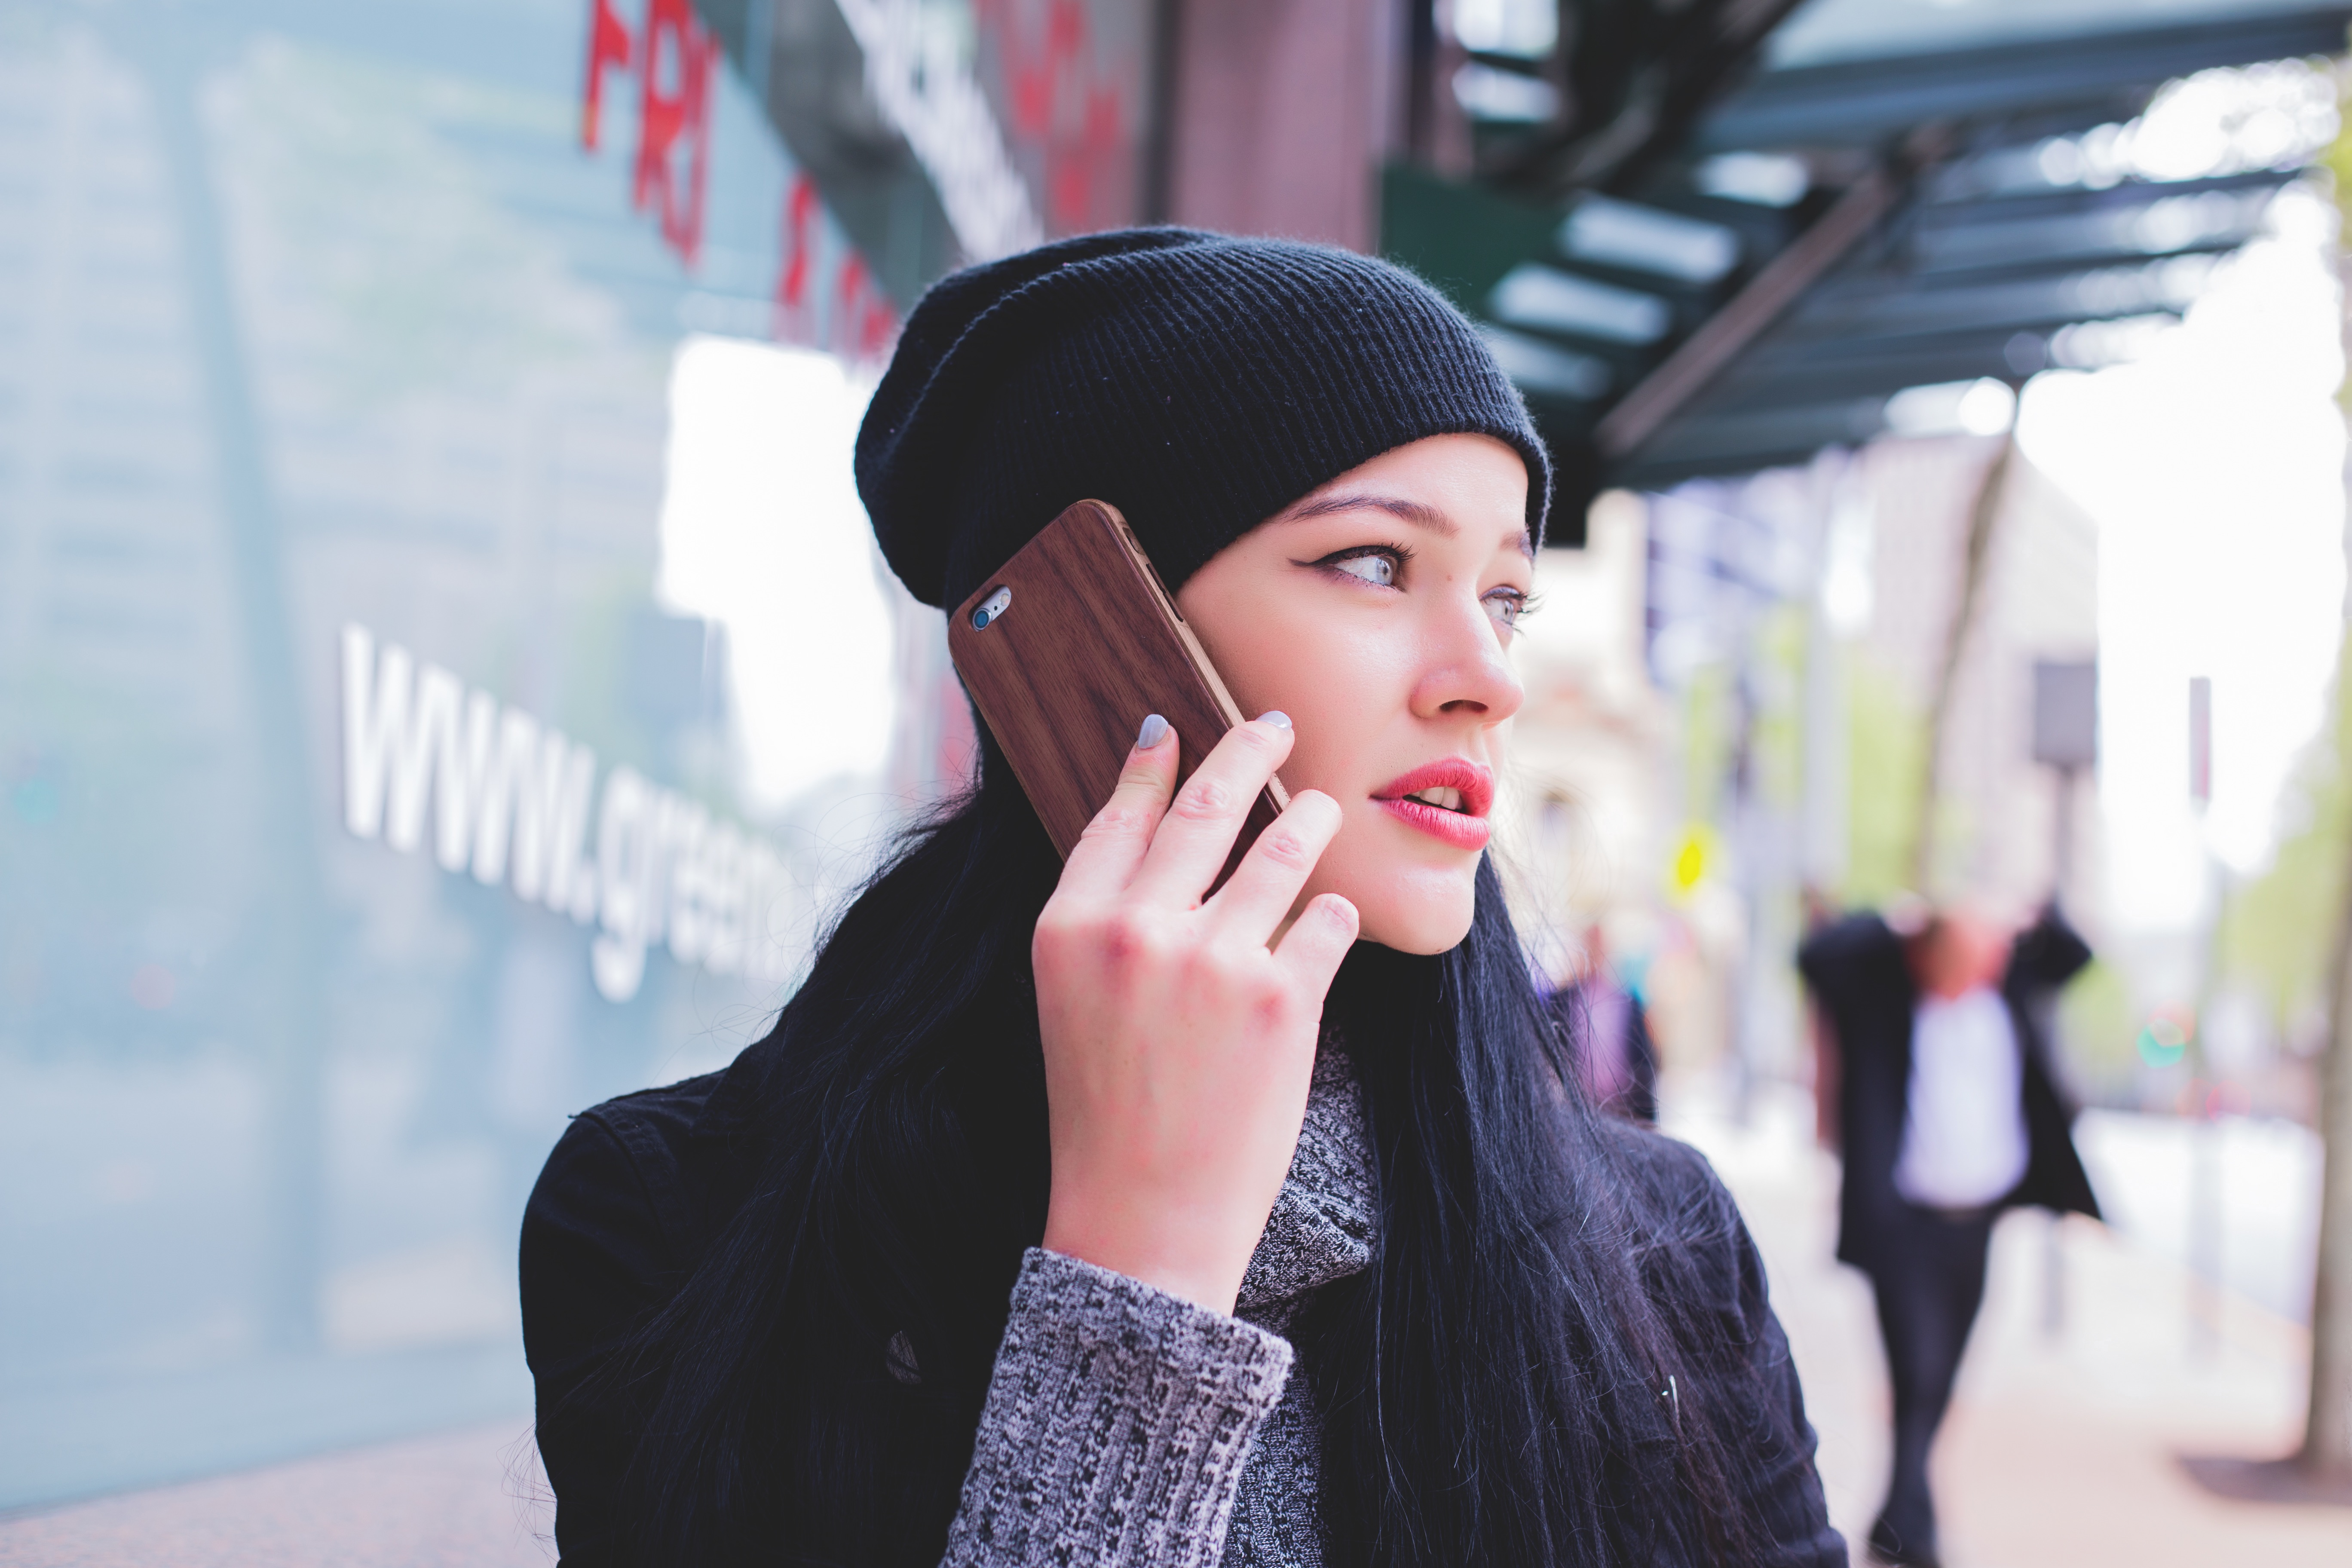 hånd mobil snak pige mobiltelefon (Foto: Pxhere)